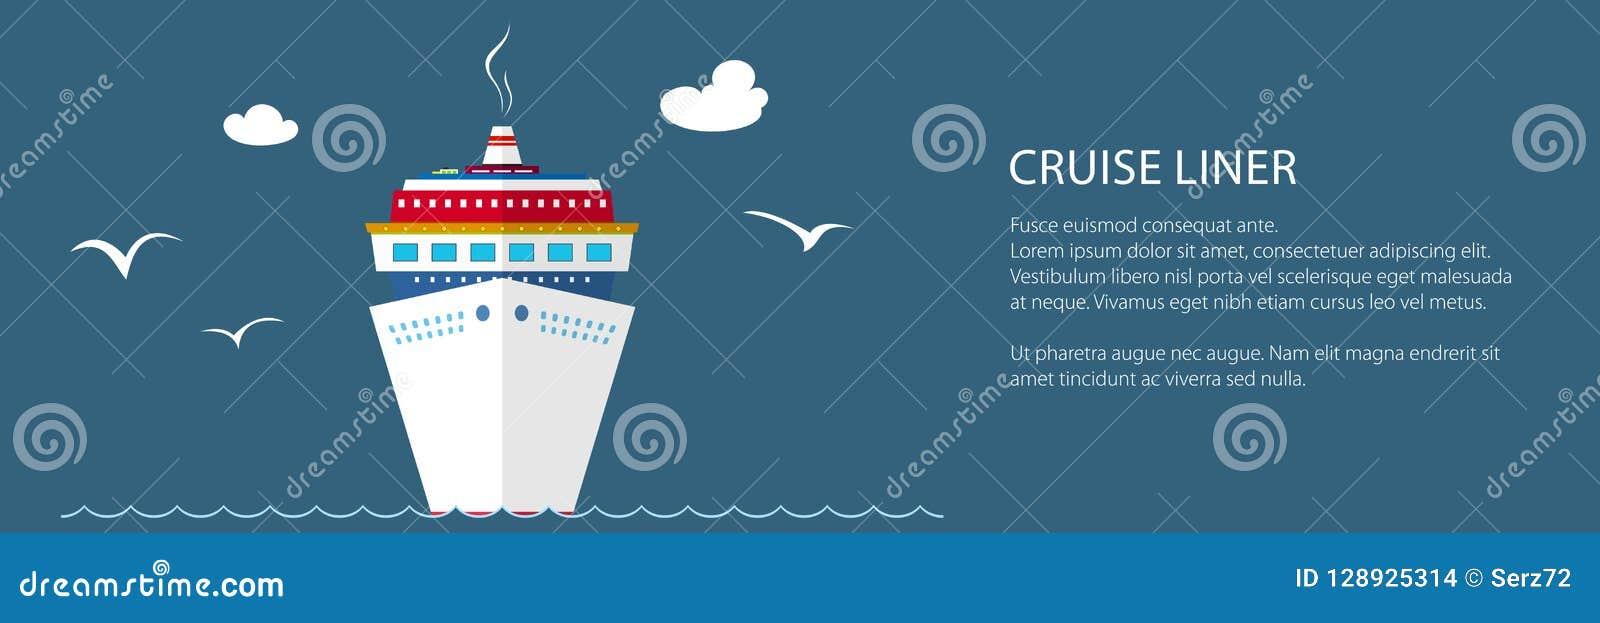 Знамя туристического судна на море